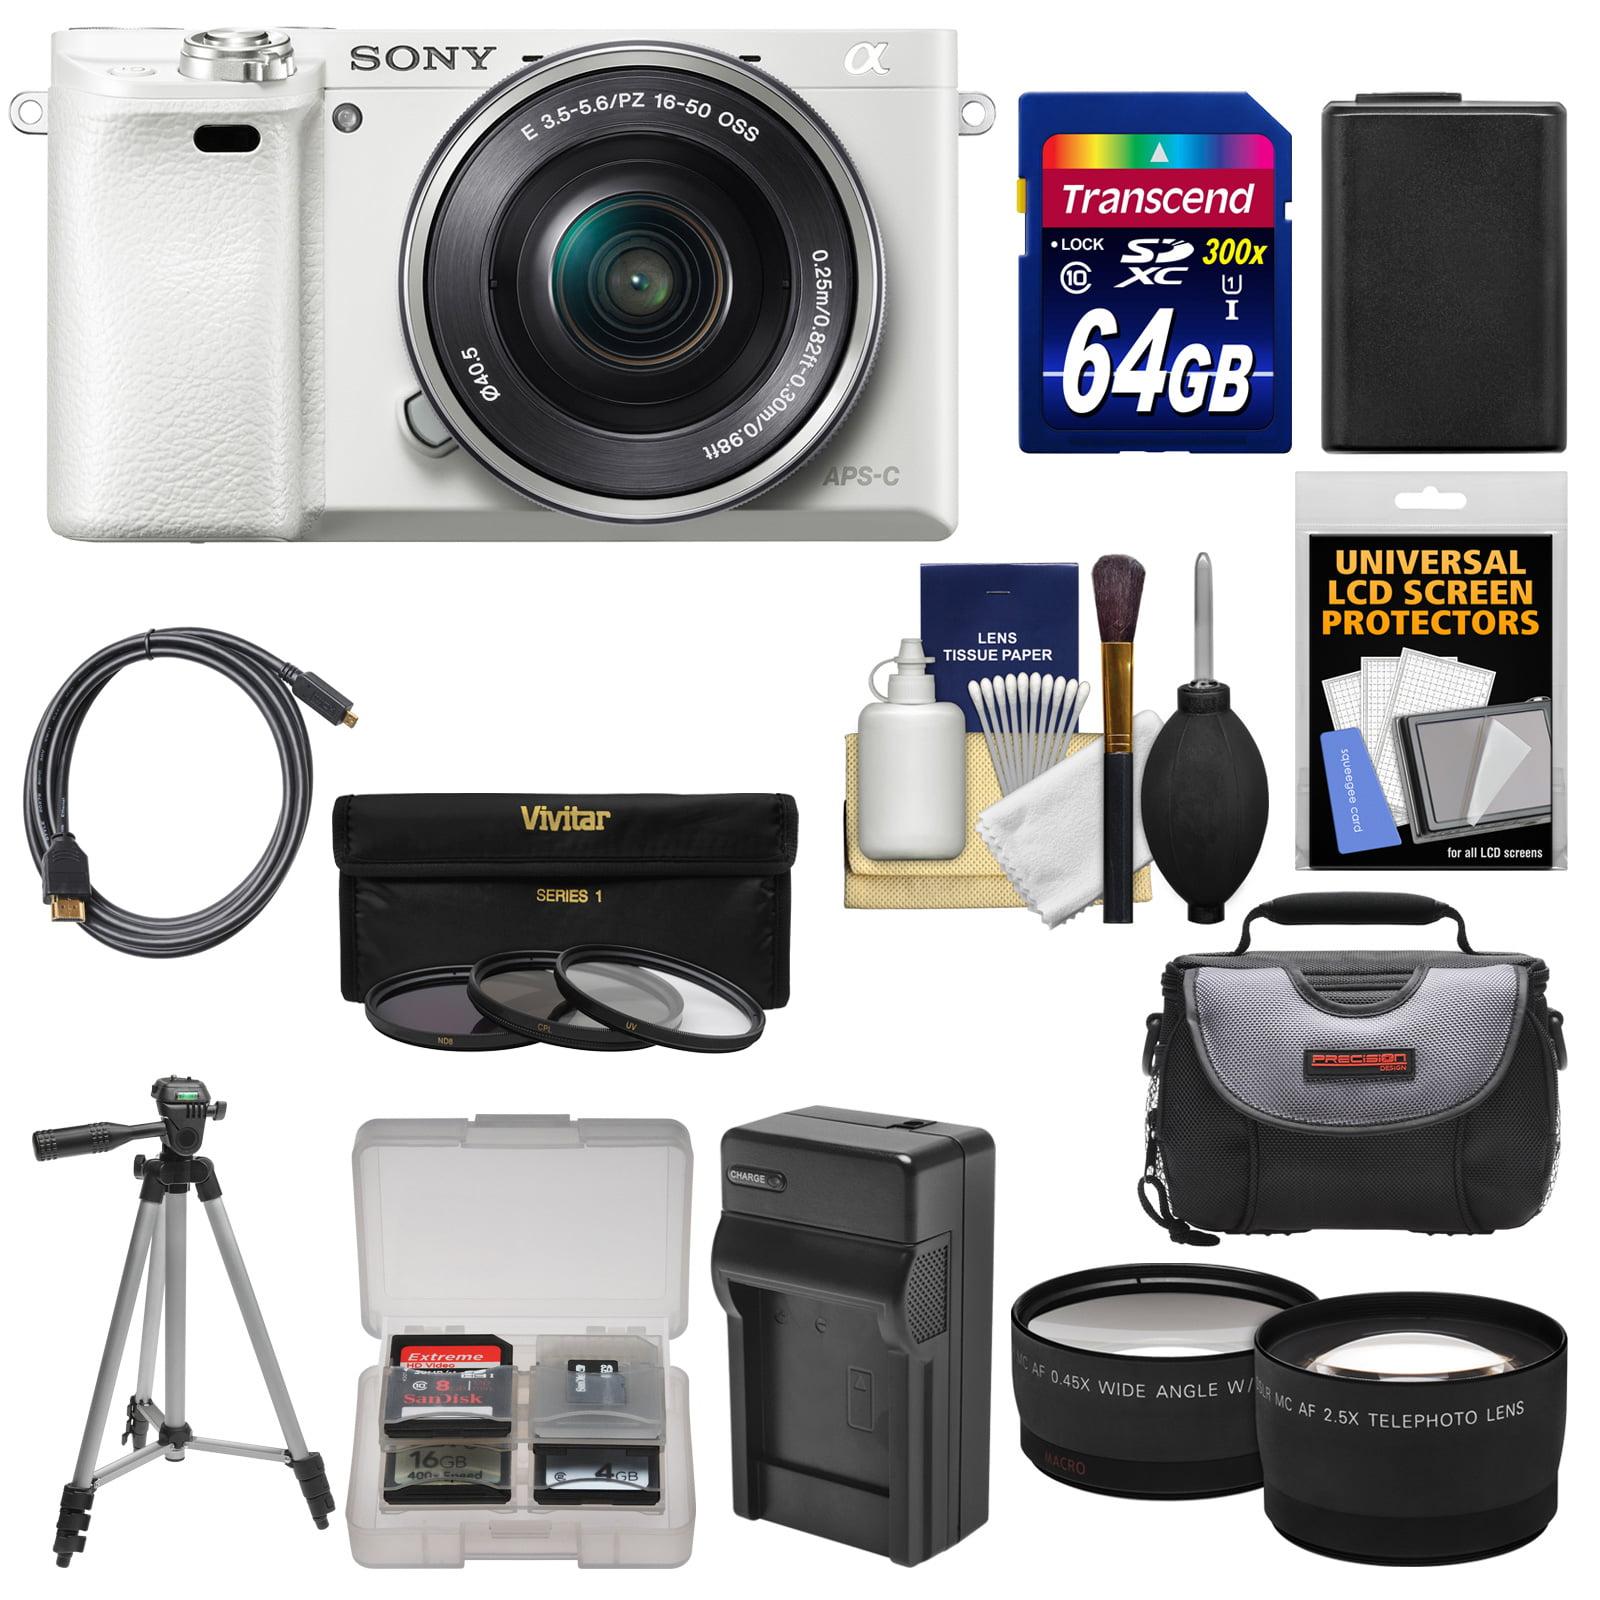 Sony Alpha A6000 Wi-Fi Digital Camera & 16-50mm Lens (White) with 64GB Card + Case +... by Sony